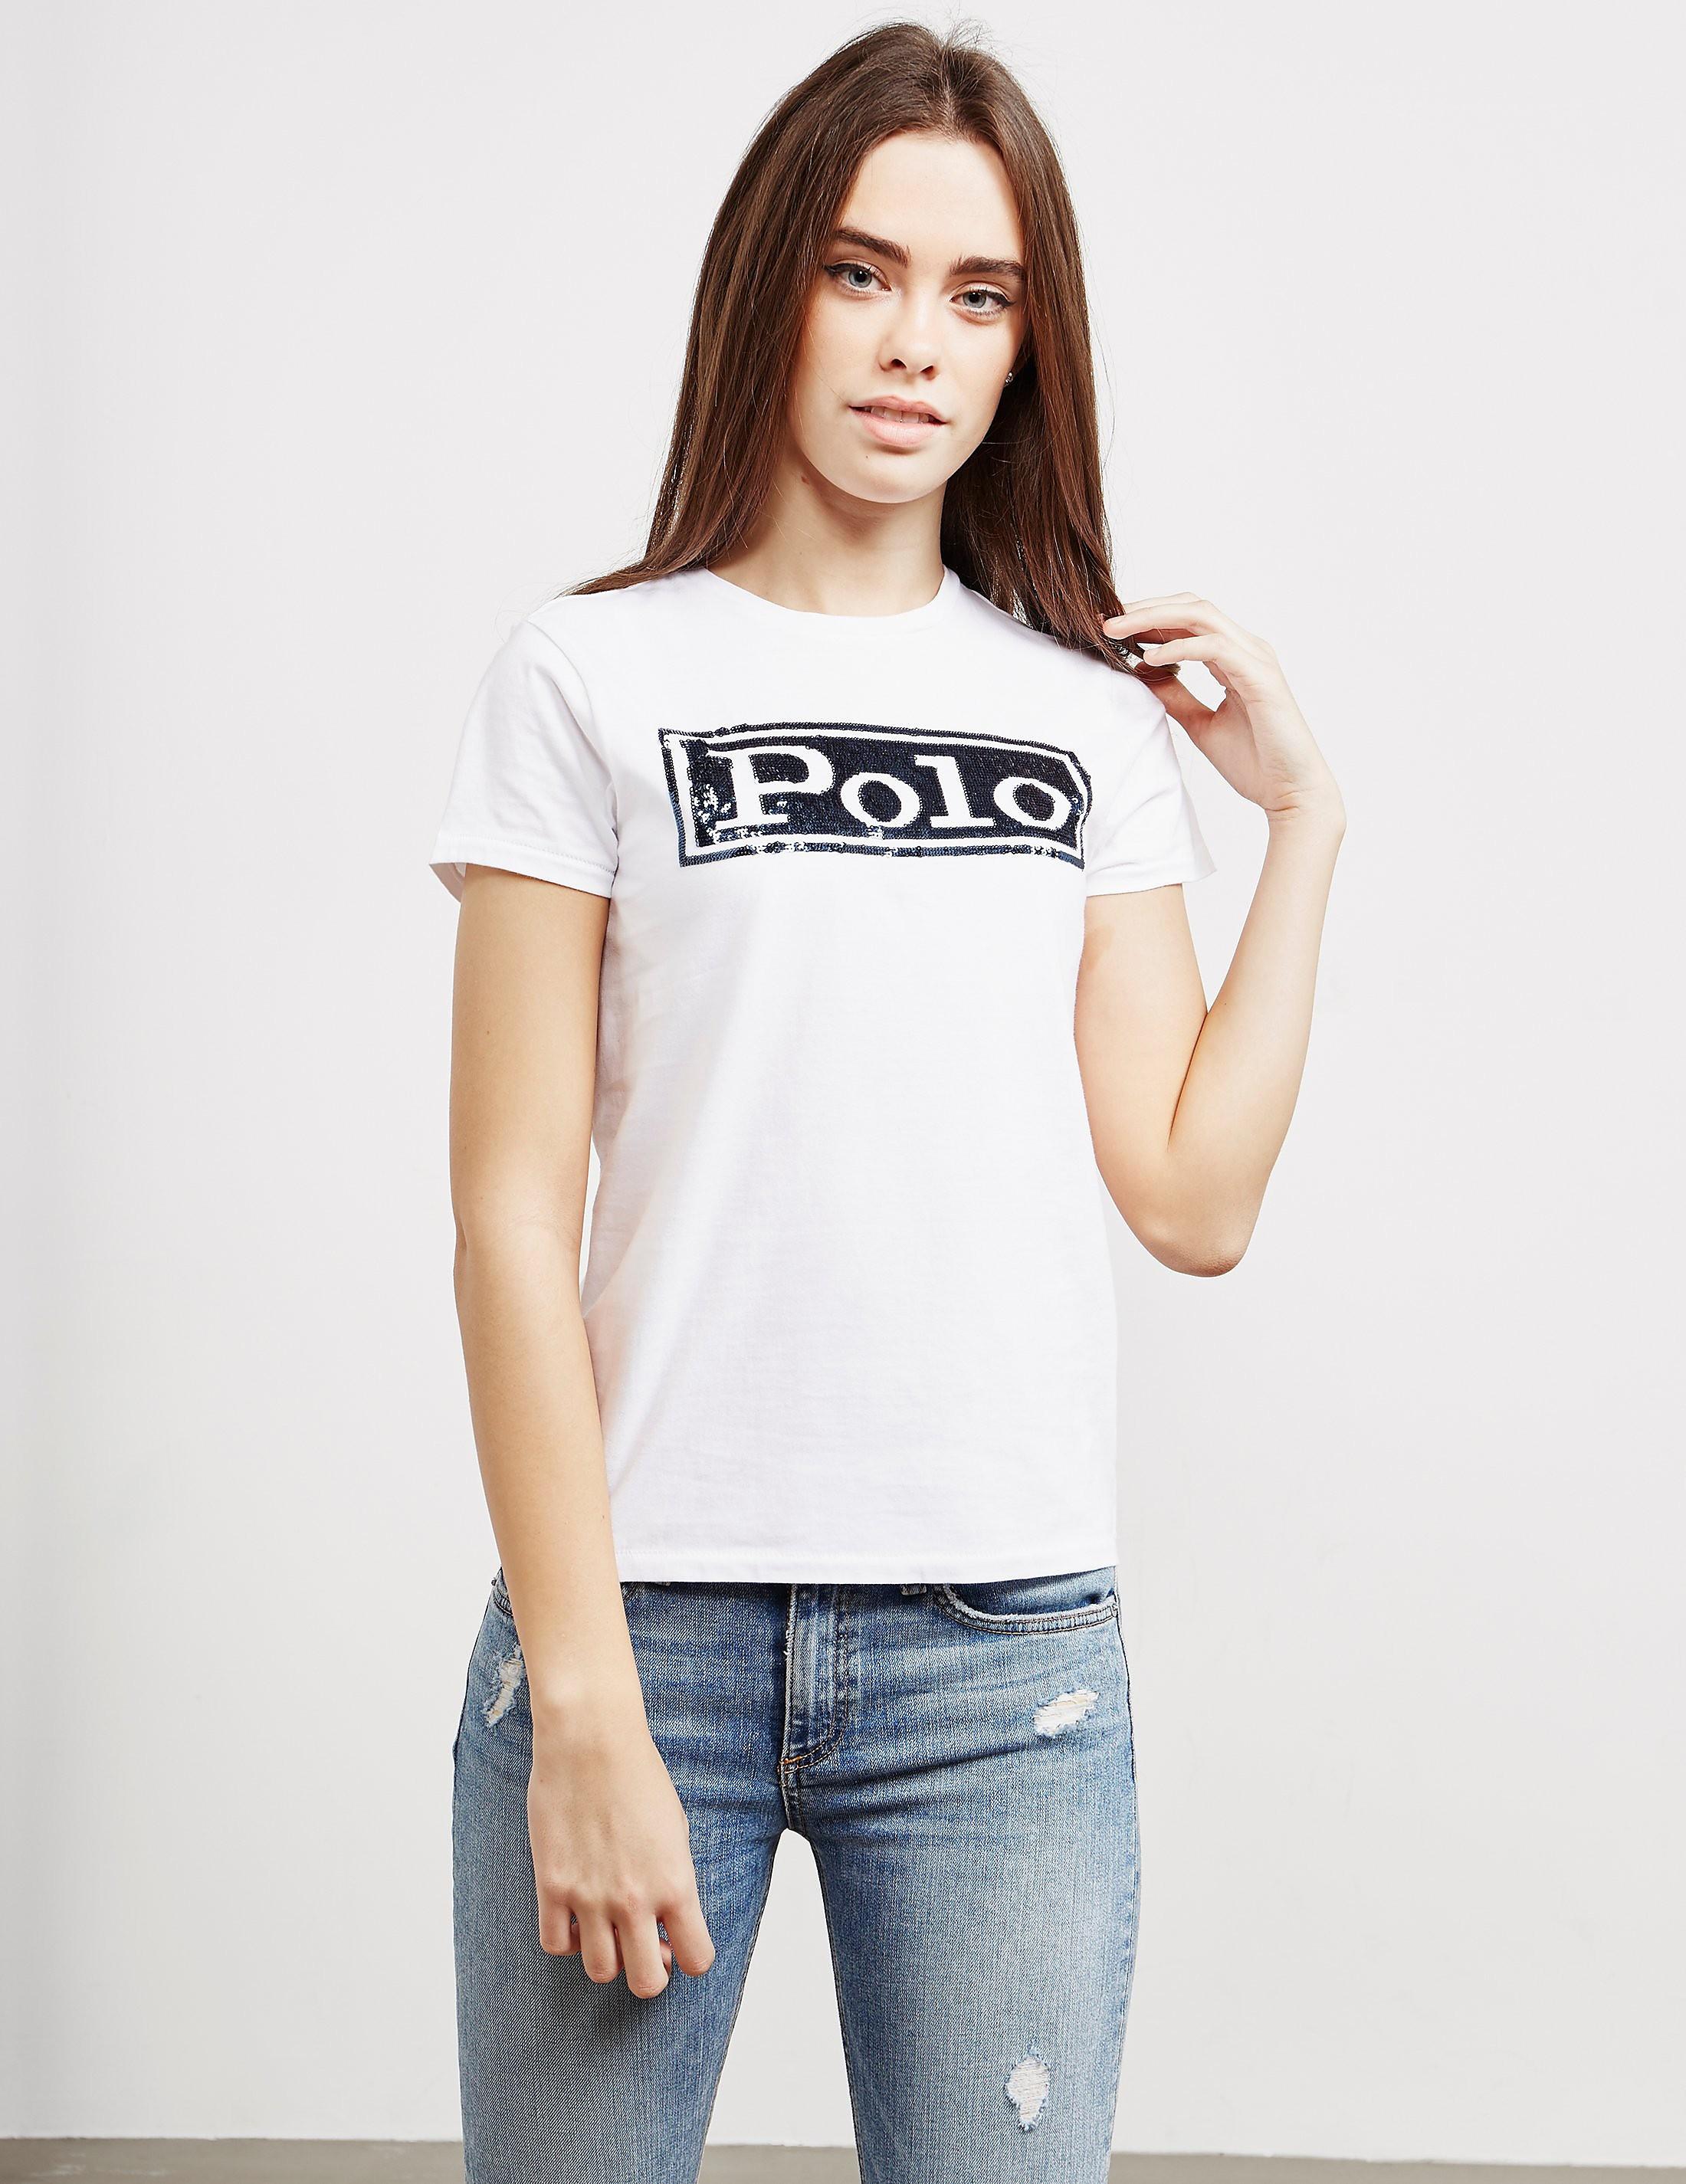 Polo Ralph Lauren Sequin Polo Short Sleeve T-Shirt